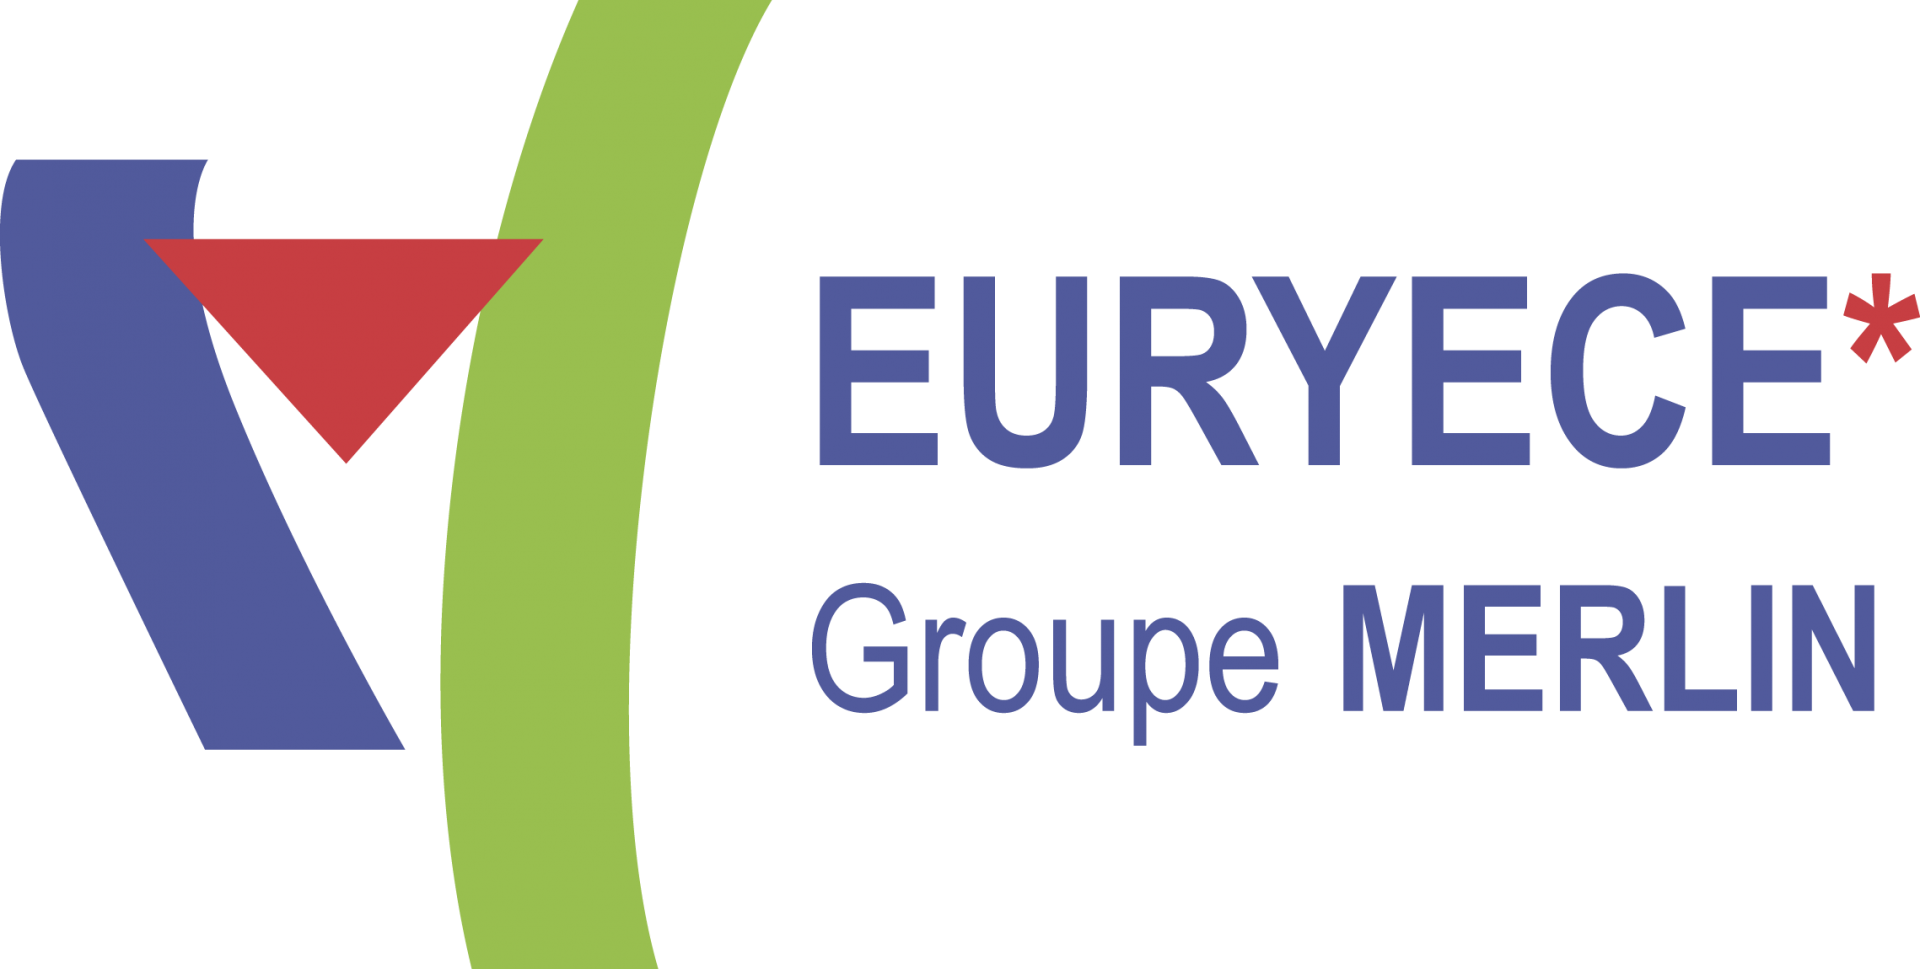 Logo euryece groupe merlin